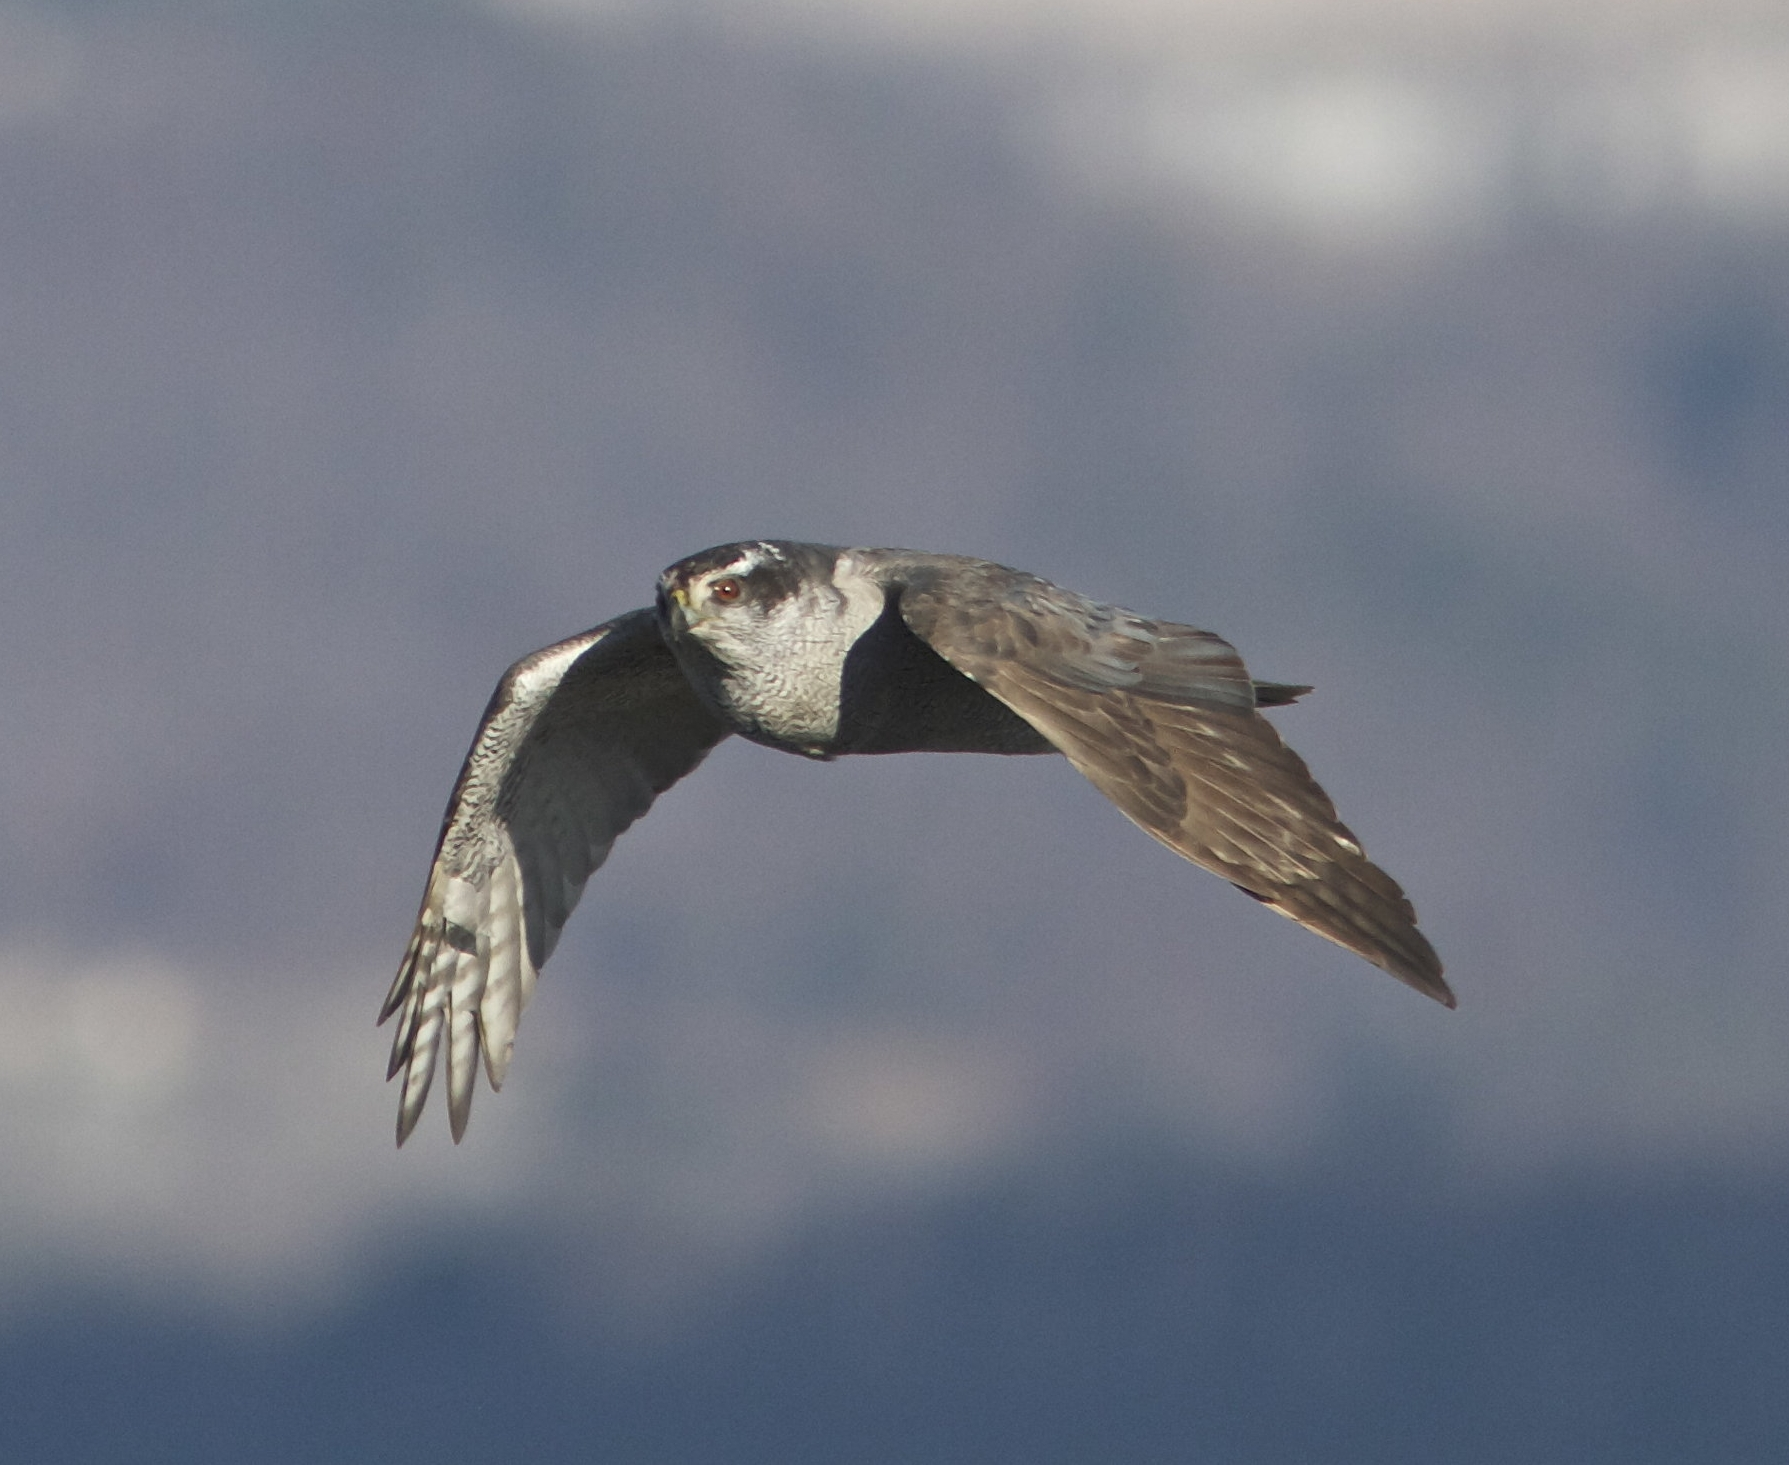 Northern Goshawk in flight. Photo by Holly Merker.